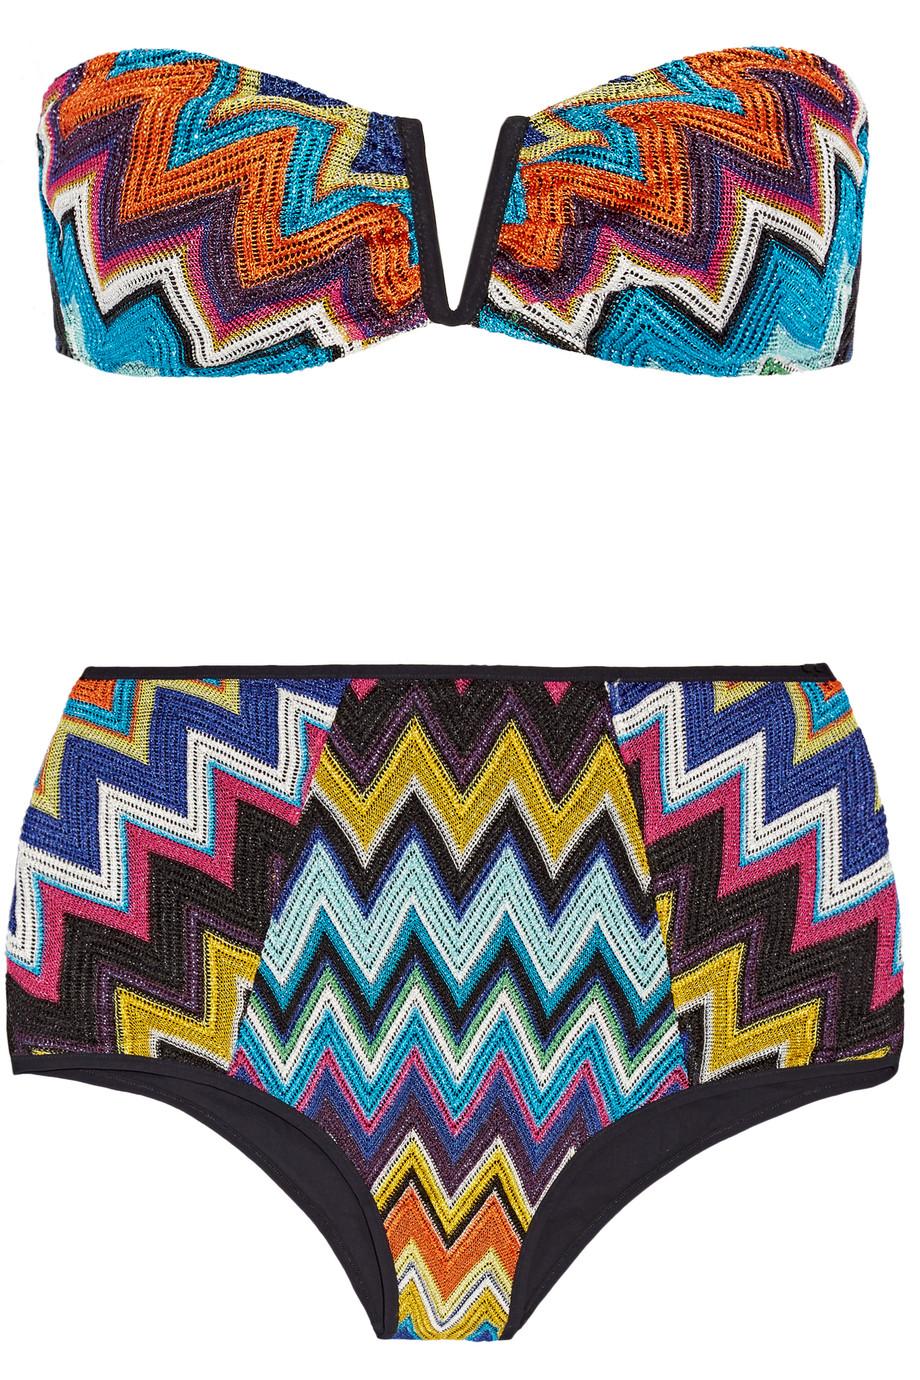 Missoni Mare Metallic Crochet-Knit Bandeau Bikini, Size: 46